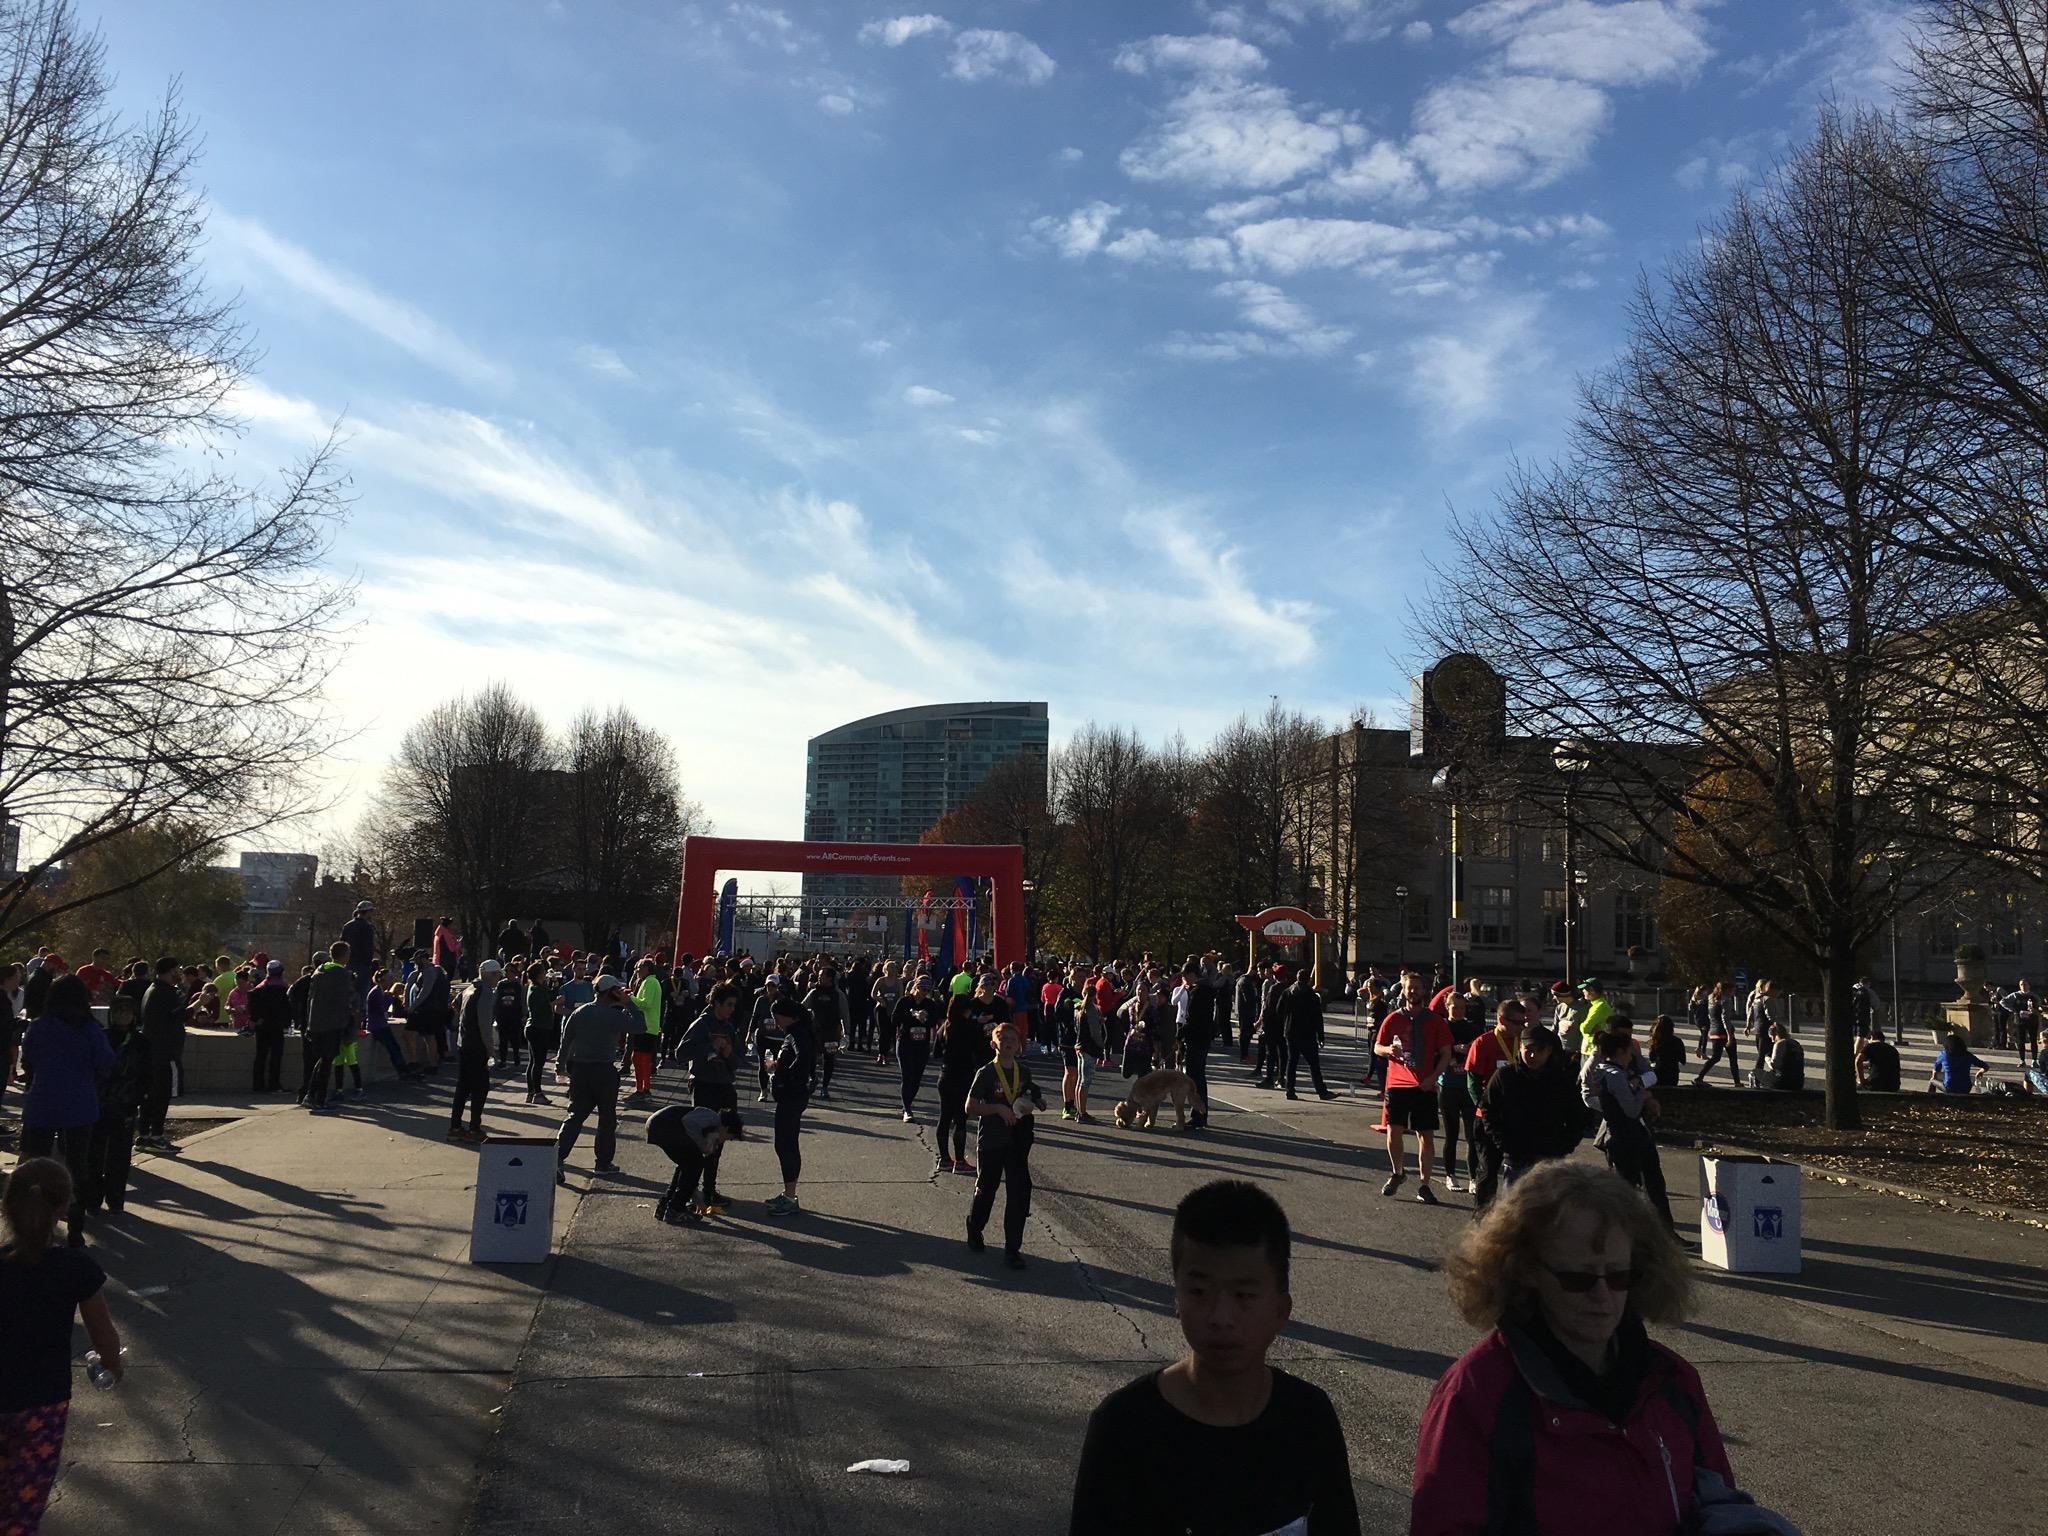 5k, 10k, 1mi, Half Marathon & Marathon Runners - USA Ohio Race Timing & Event Management www.ohioracetiming.com